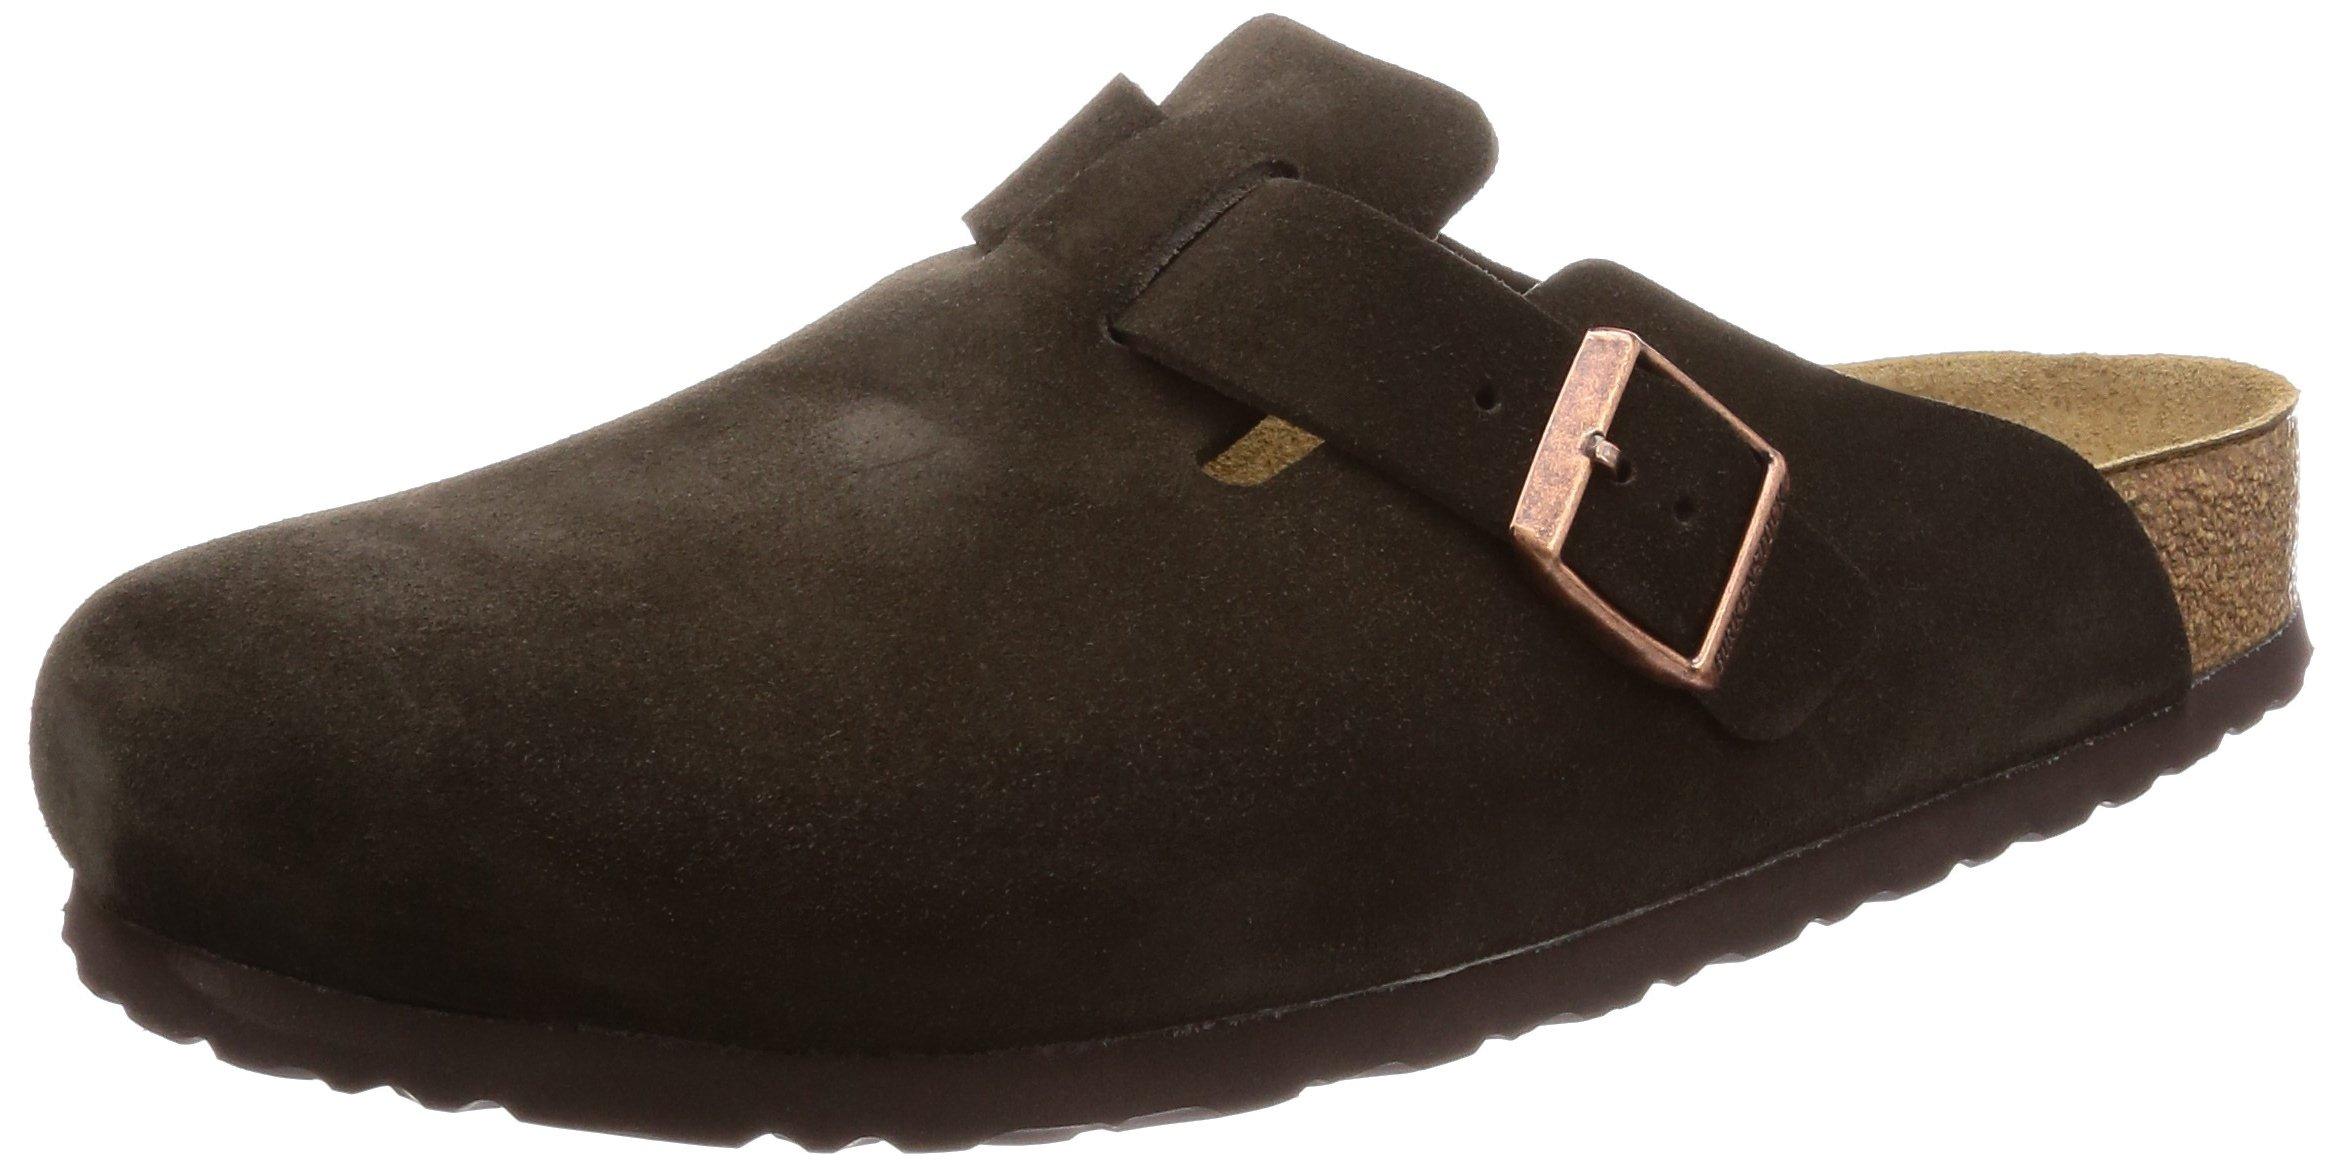 71Dc7RX7T2L - Arcopedico Womens LS 1151 Fabric Shoes